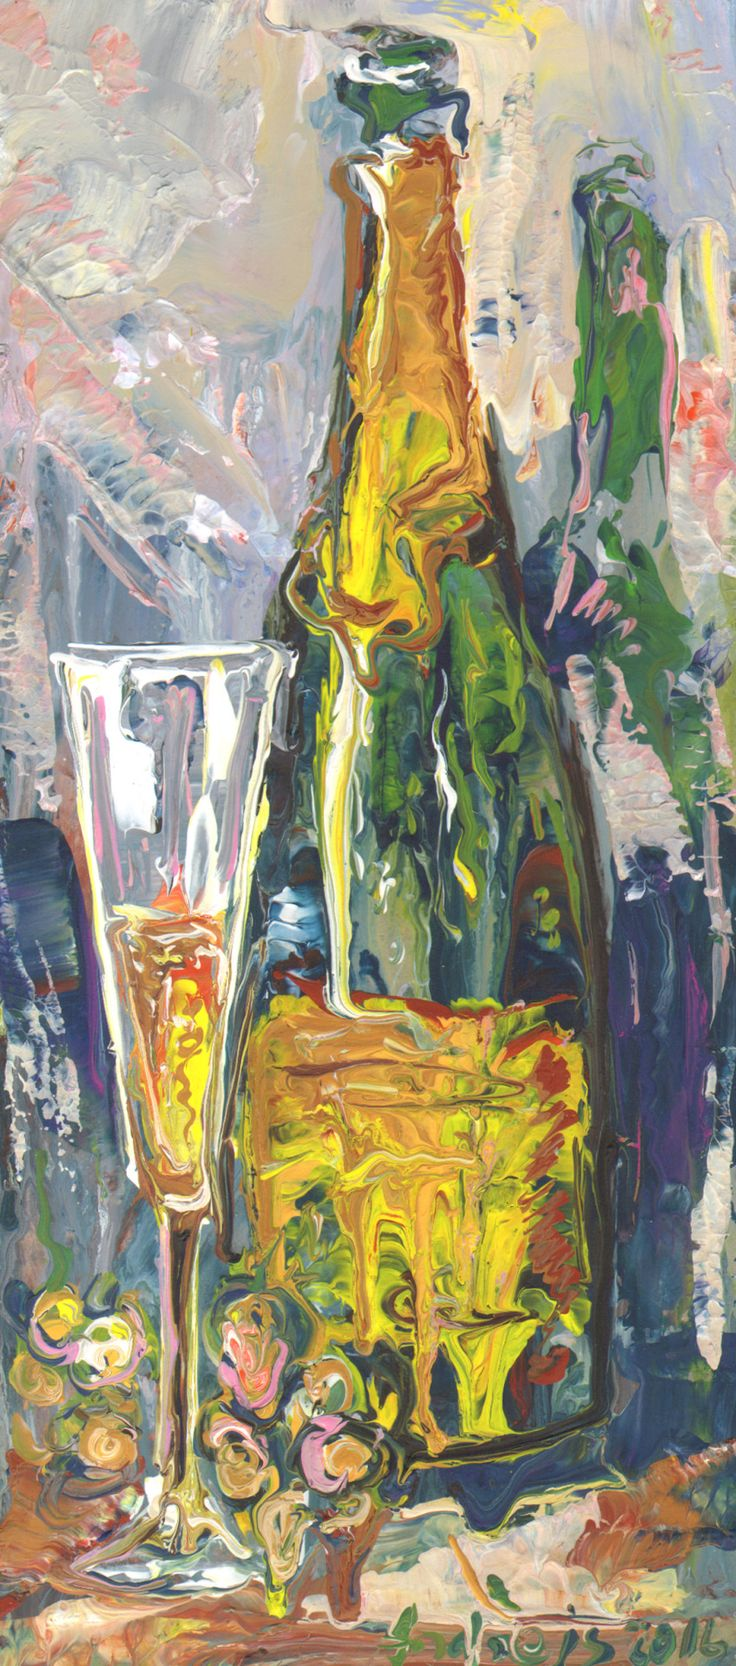 2016.10.5. Šampanieša glāze ar pudeli un vīnogām The glass of champagne with bottle and grapes acrylic/board, 40x18 cm https://www.facebook.com/andrey.bovtovich